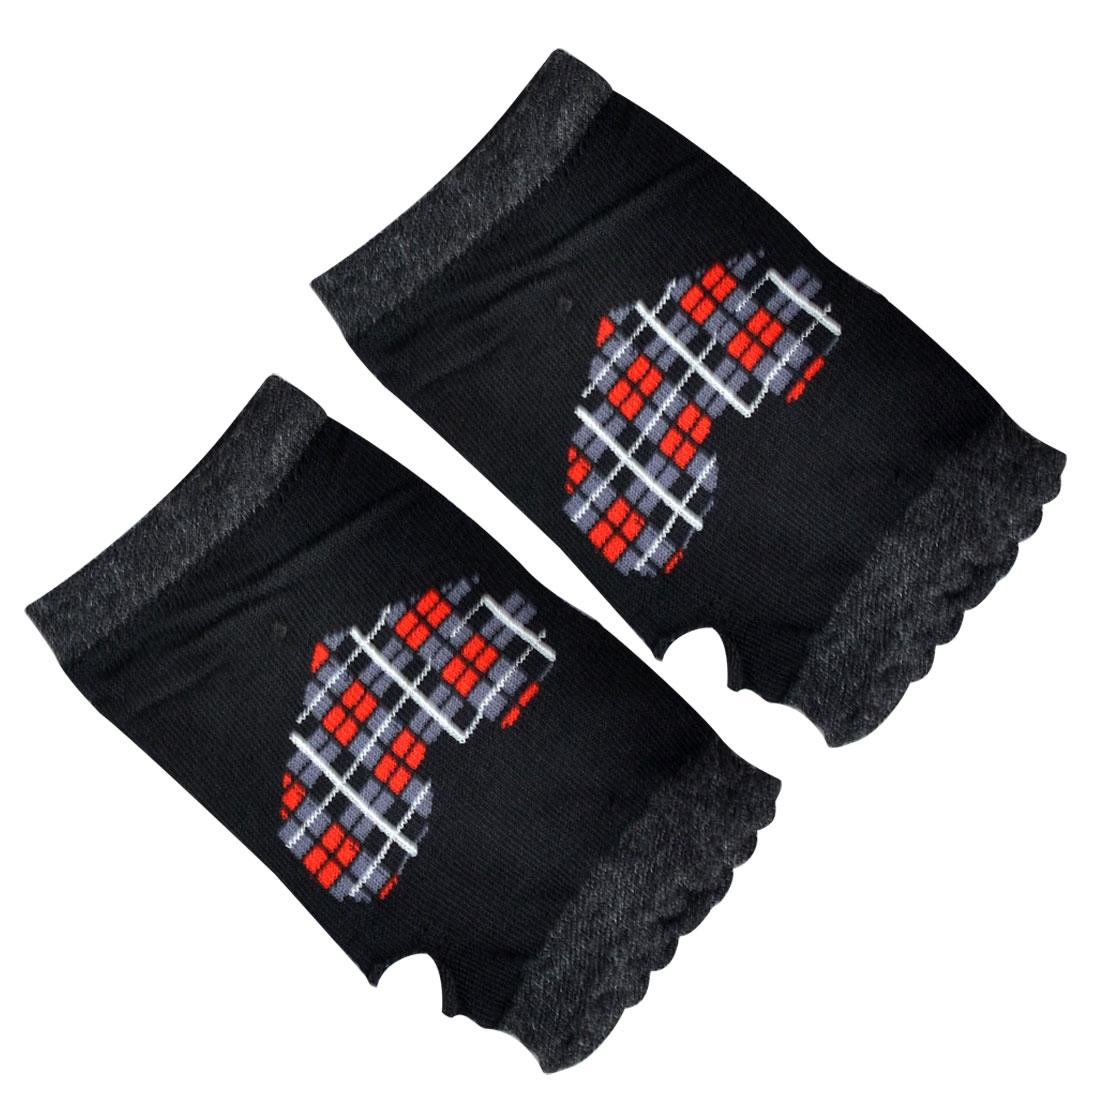 Lady Black Gray Heart Pattern Seamless Elastic Thumbhole Wrist Warmer Gloves